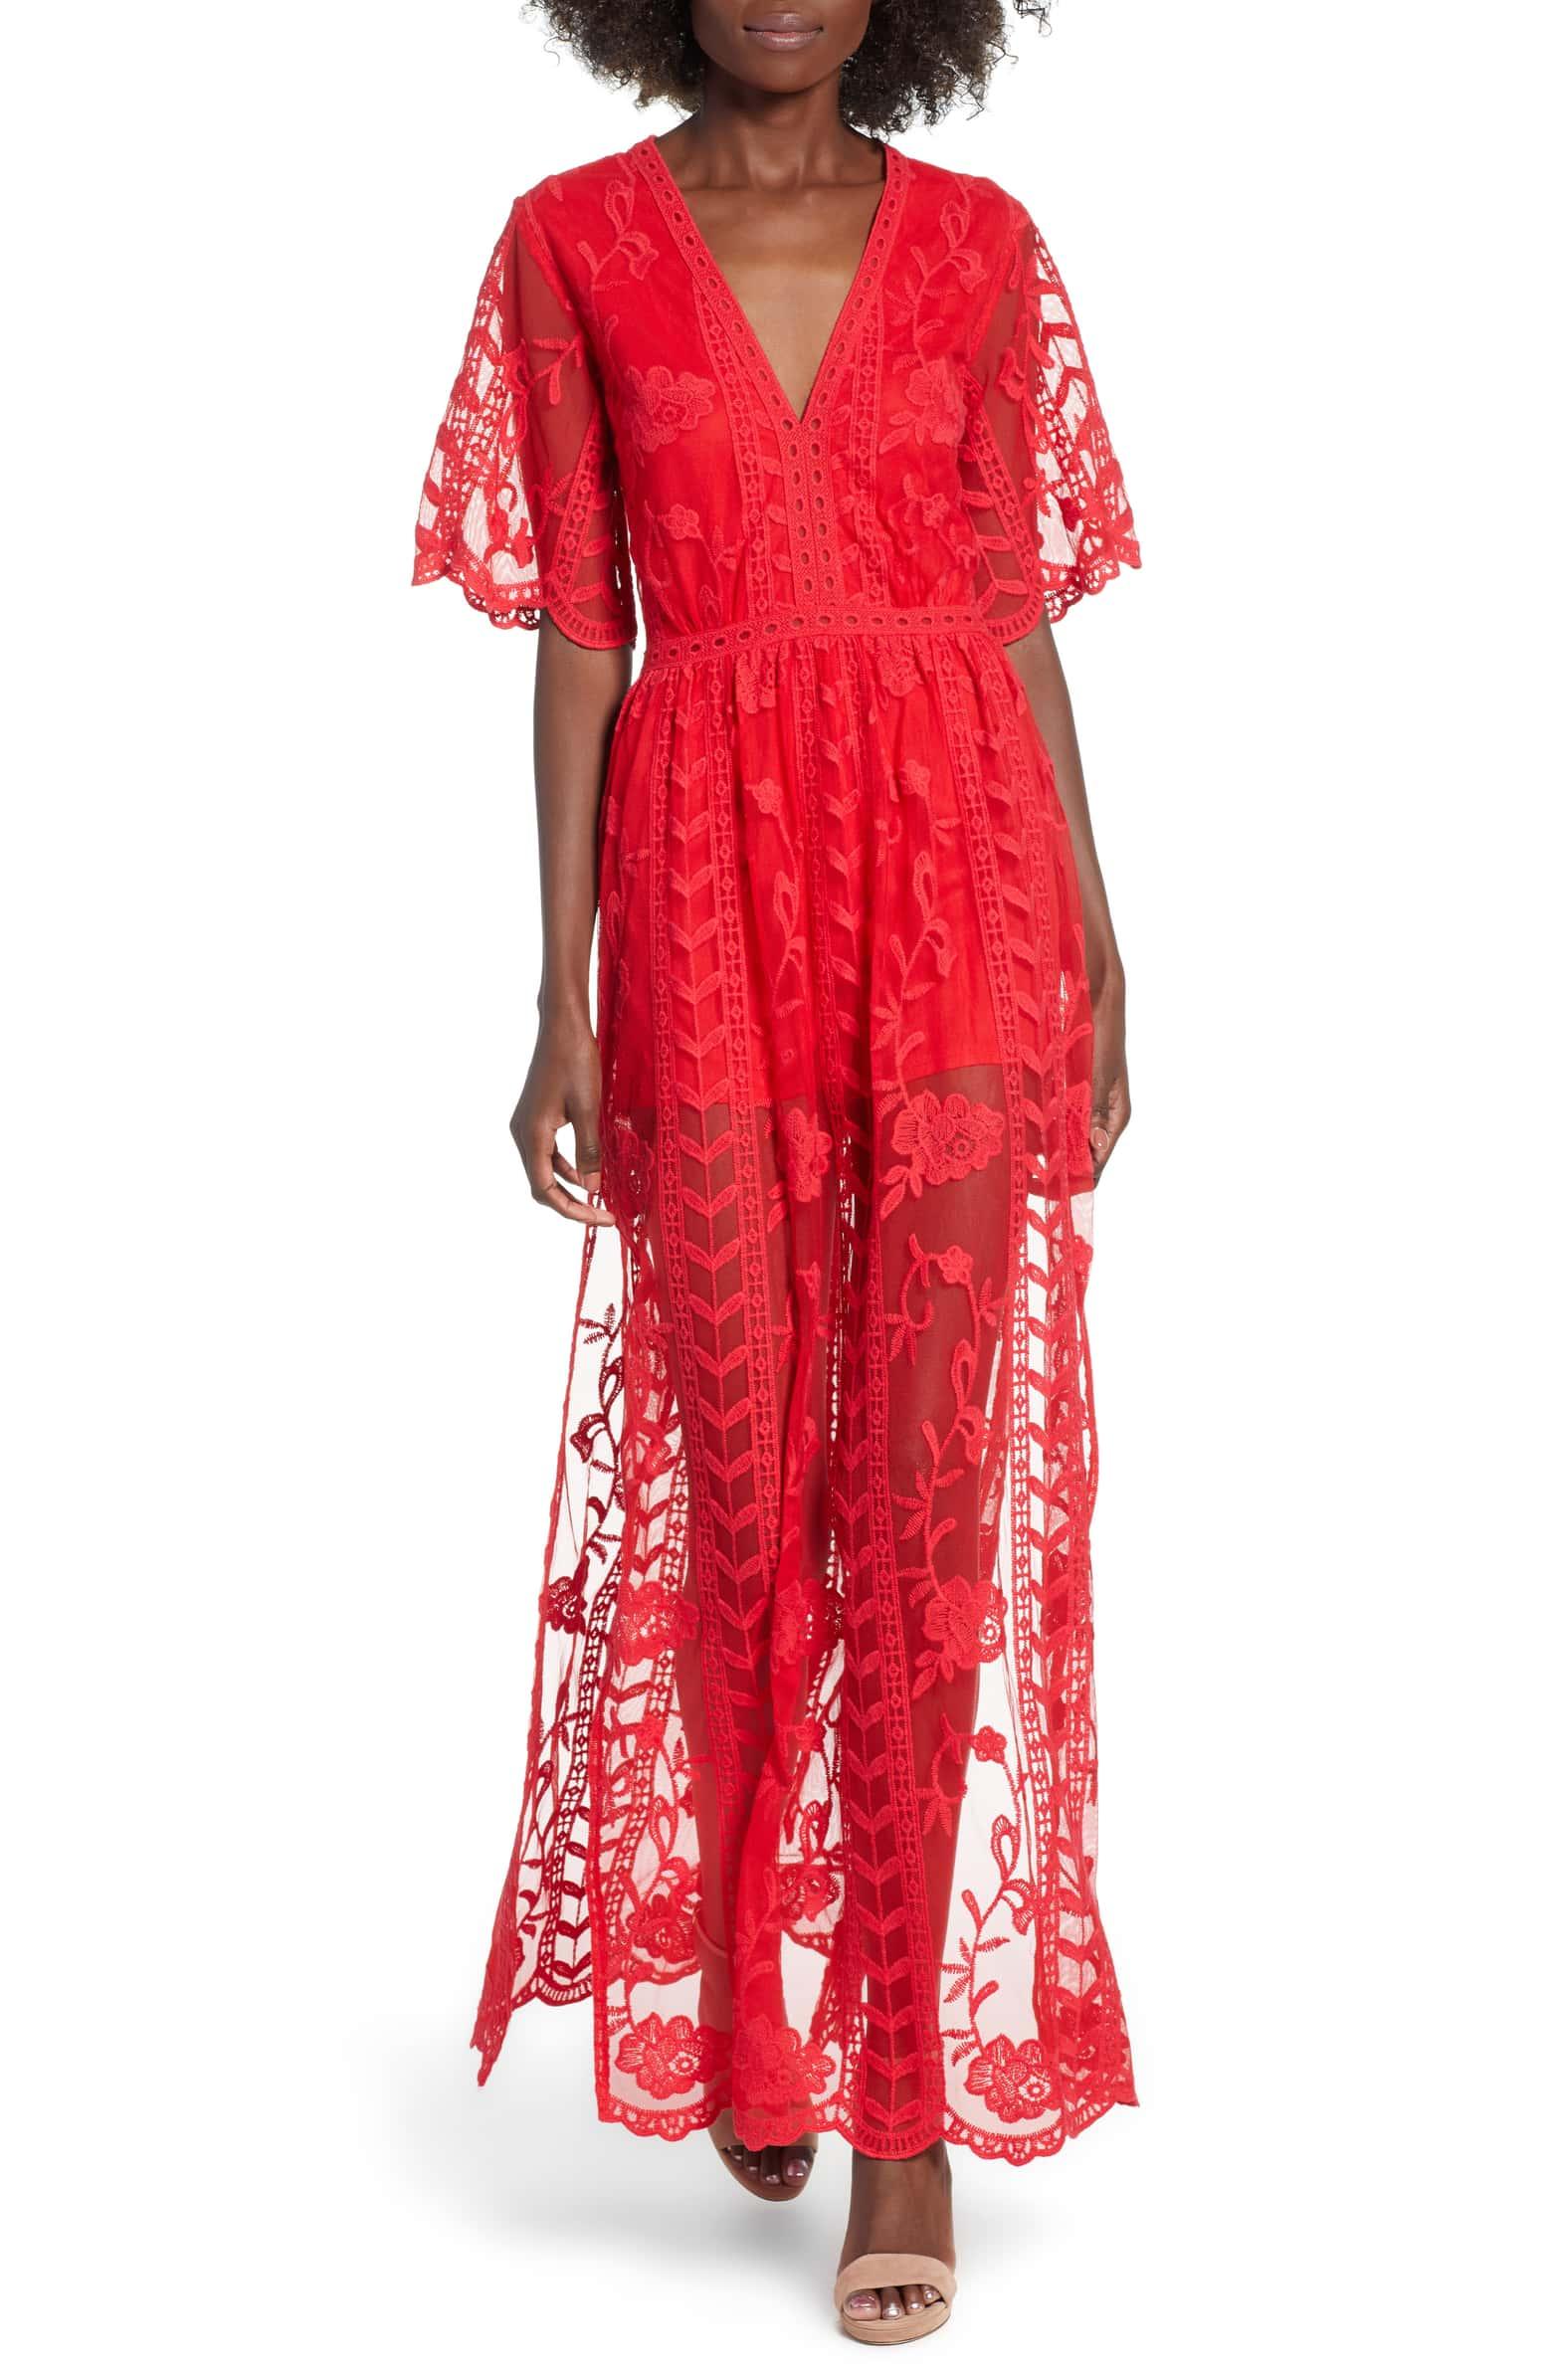 What to Wear on Valentine's Day   It's Megan   #valentinesday #fashion #whattowear #ootd